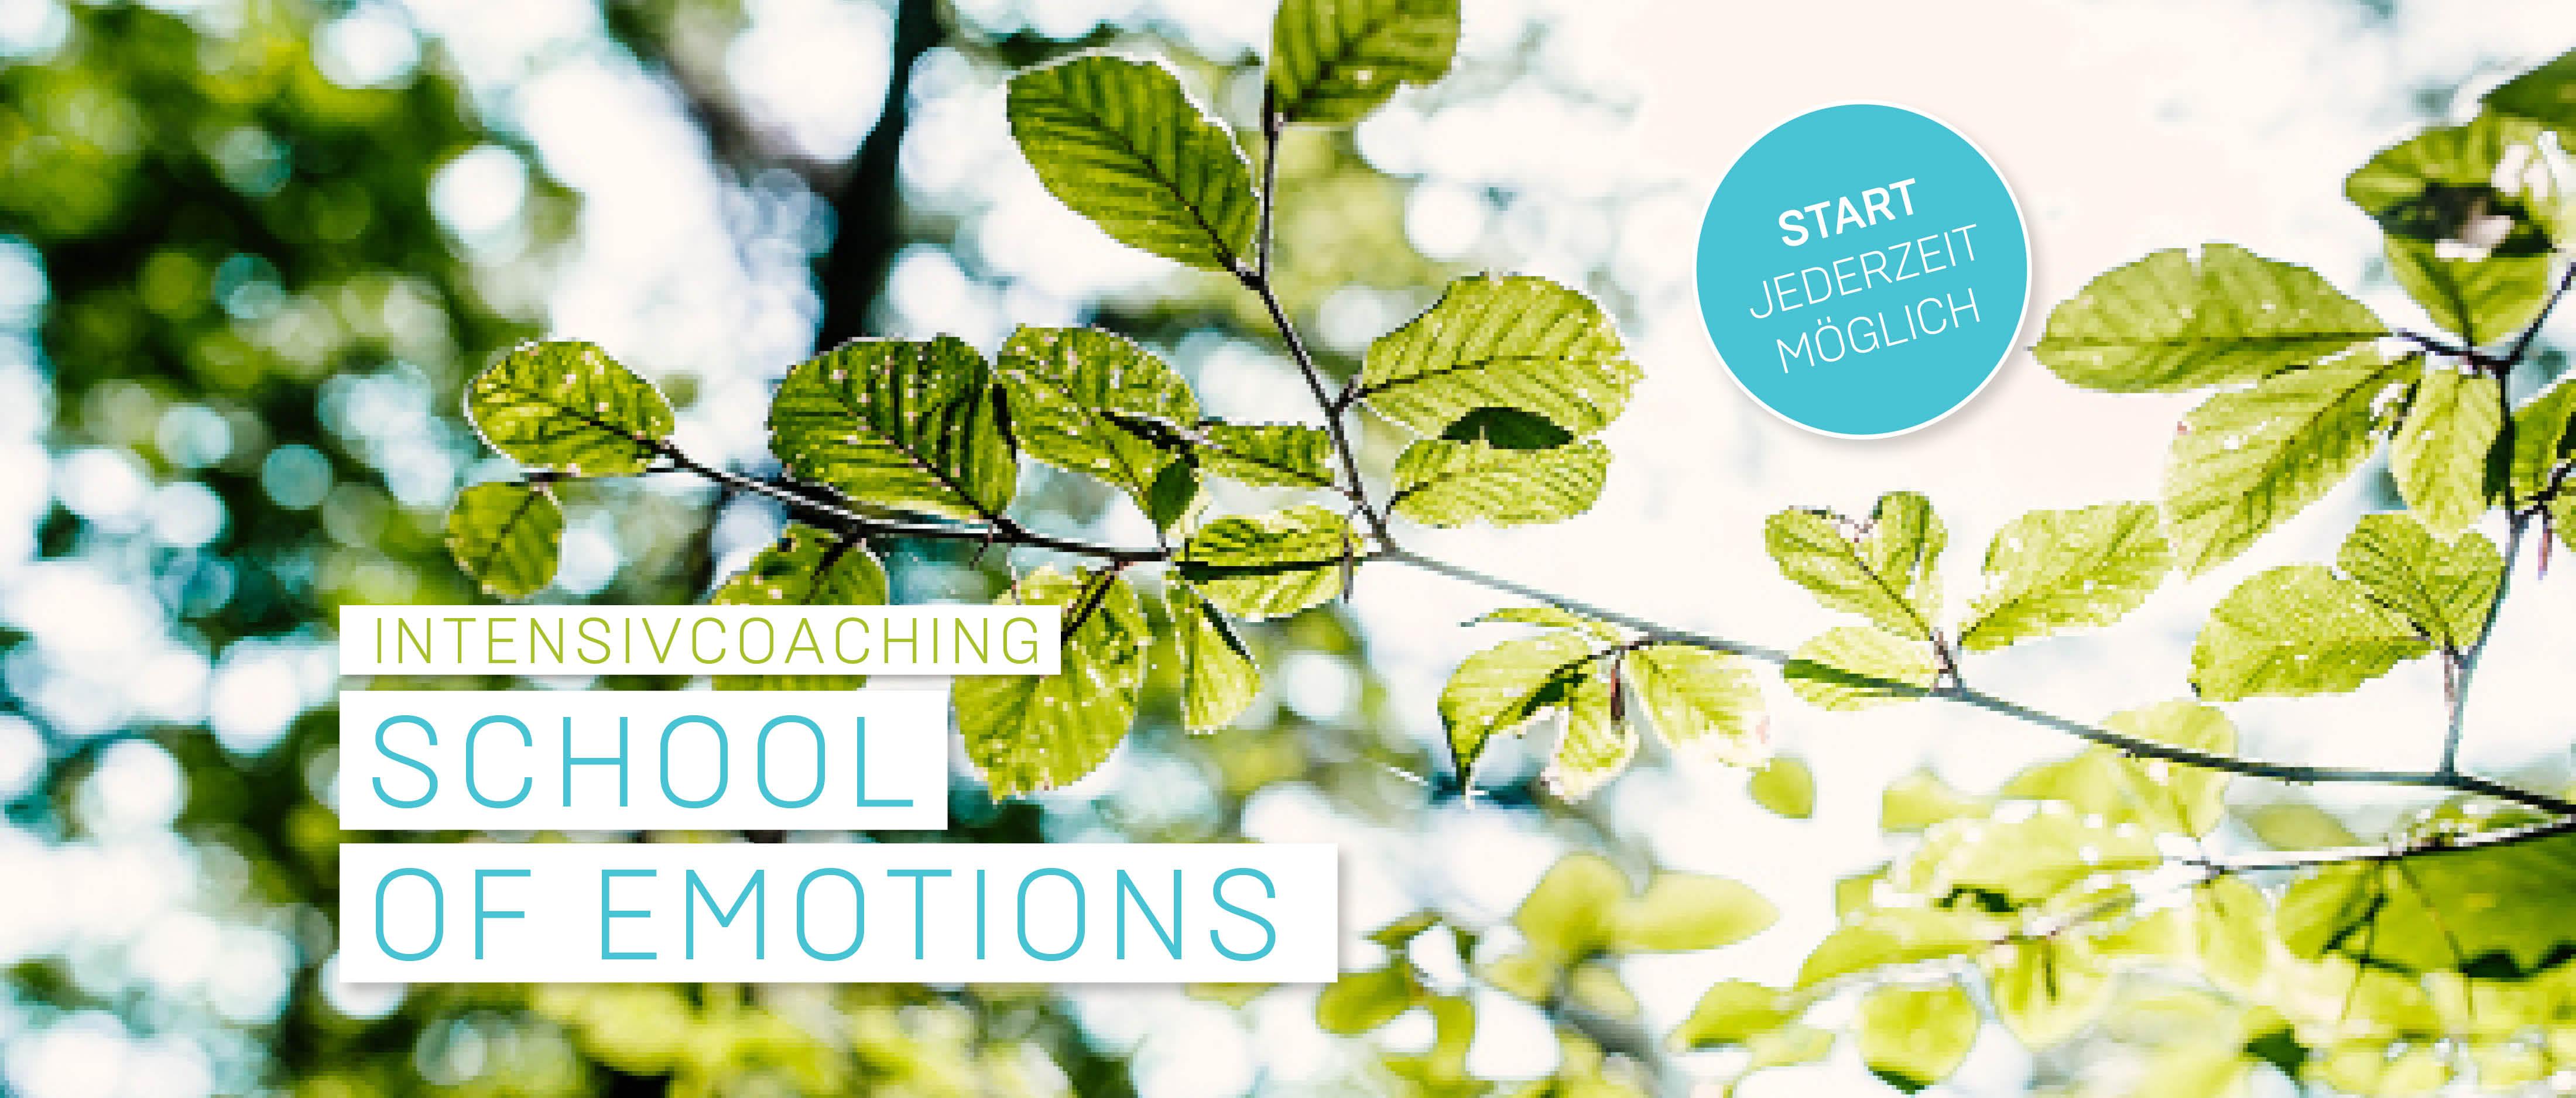 School of Emotions